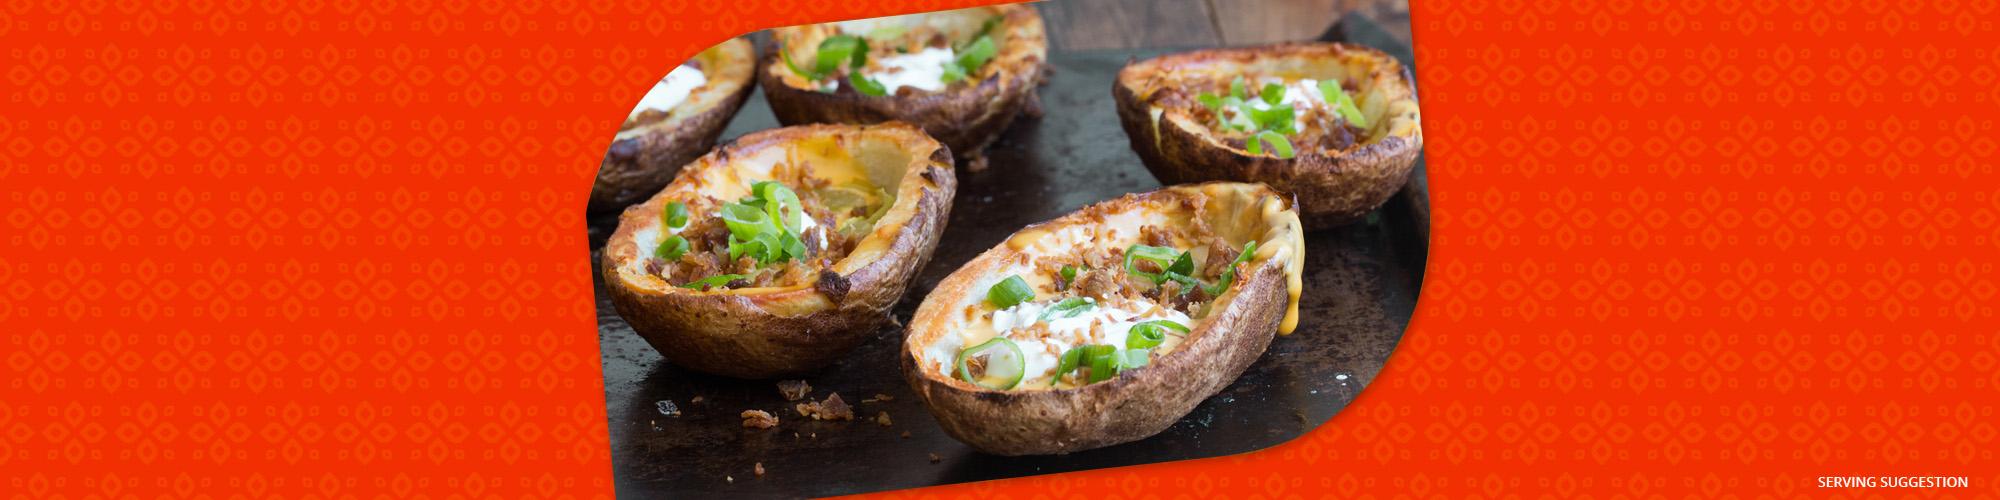 Salsas fiesta potato skins